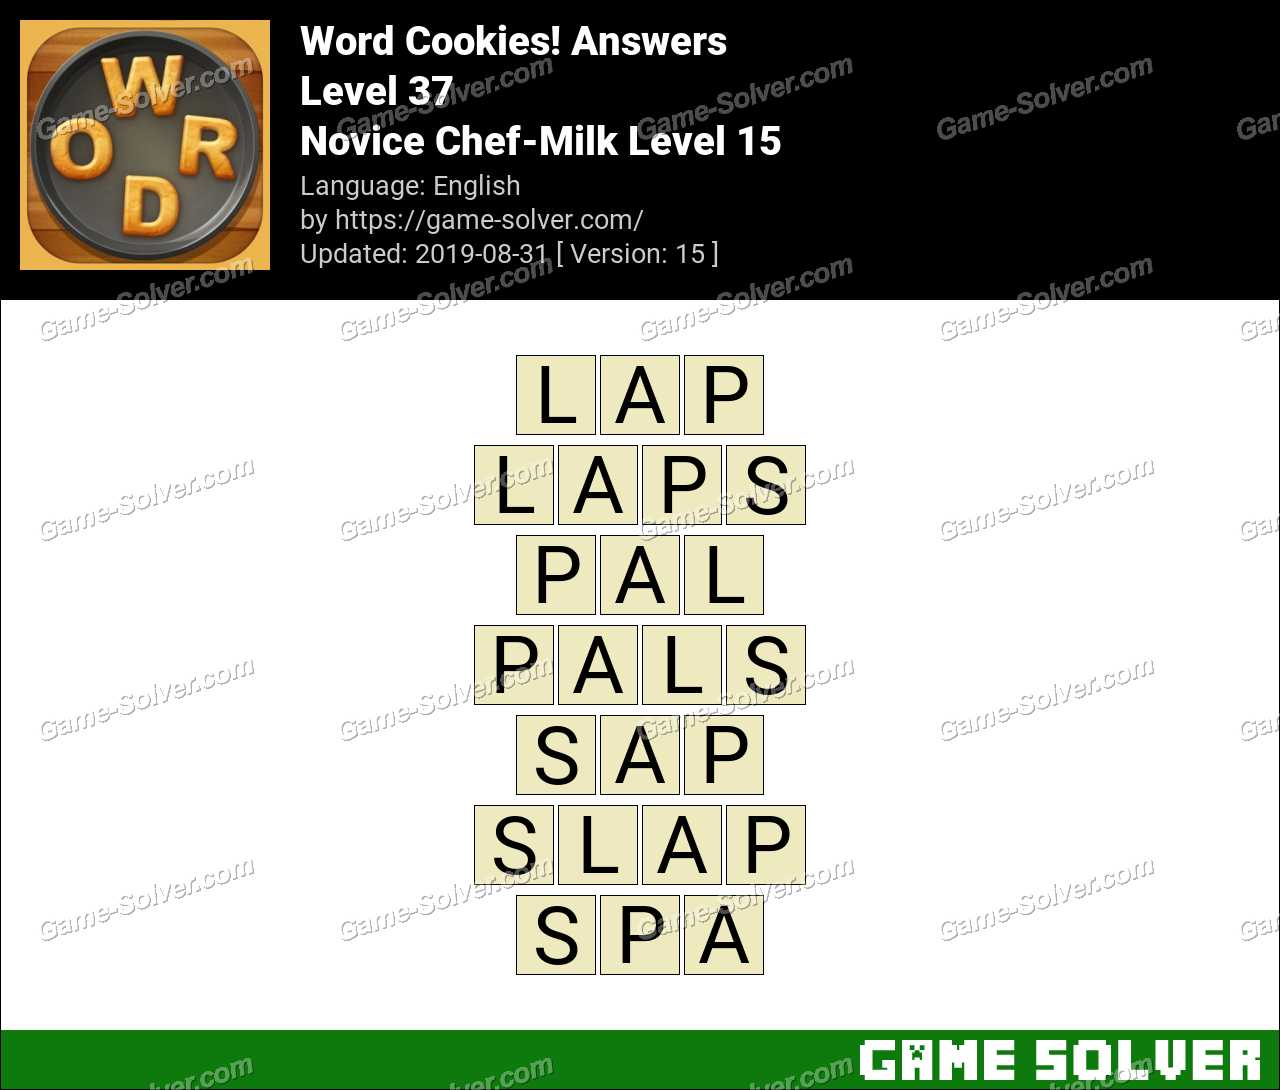 Word Cookies Novice Chef-Milk Level 15 Answers